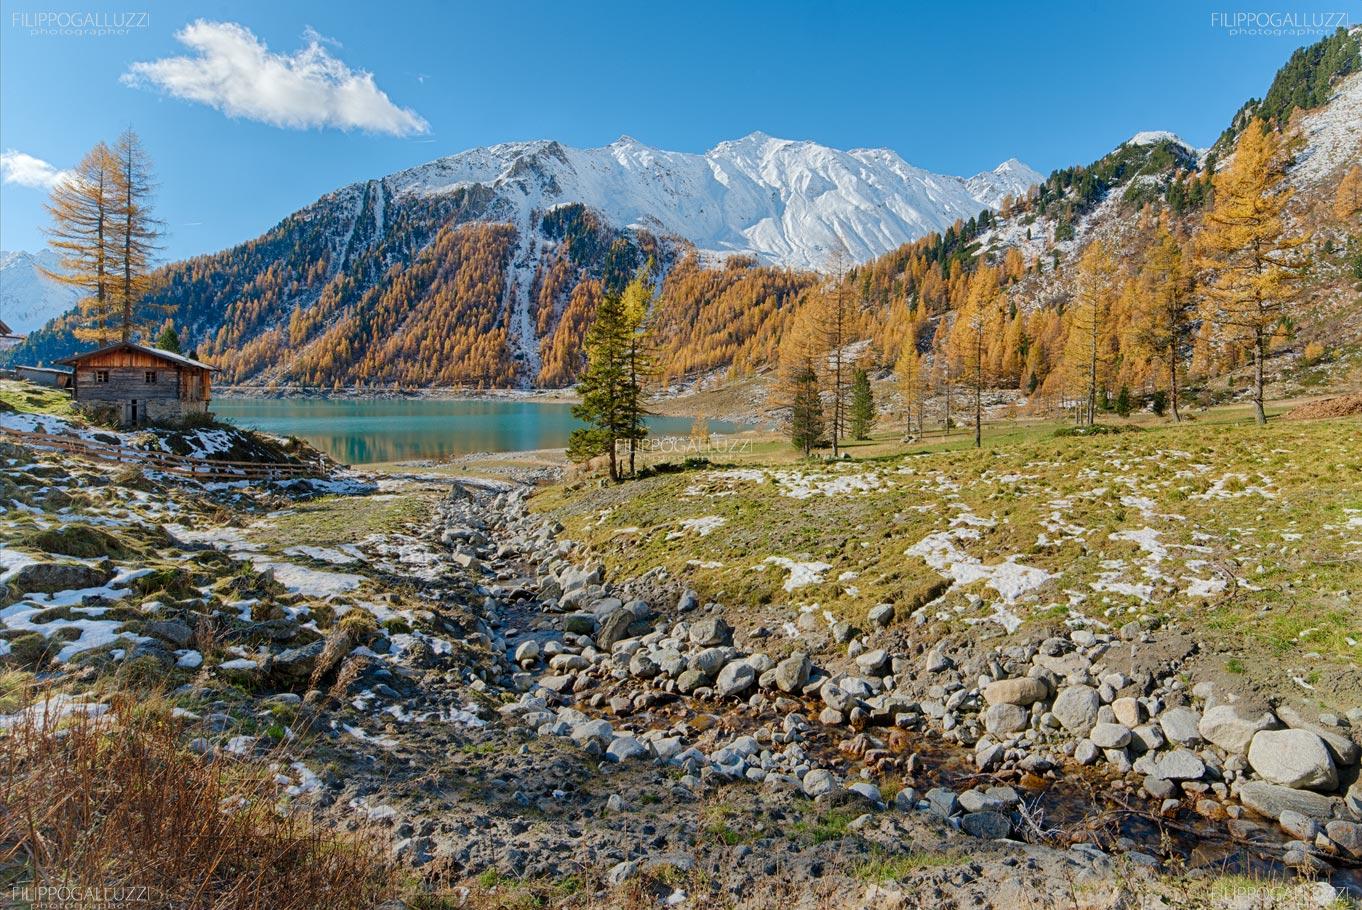 Alto Adige , Autunno - Larici dorati sul lago di Neves, Valle Aurina